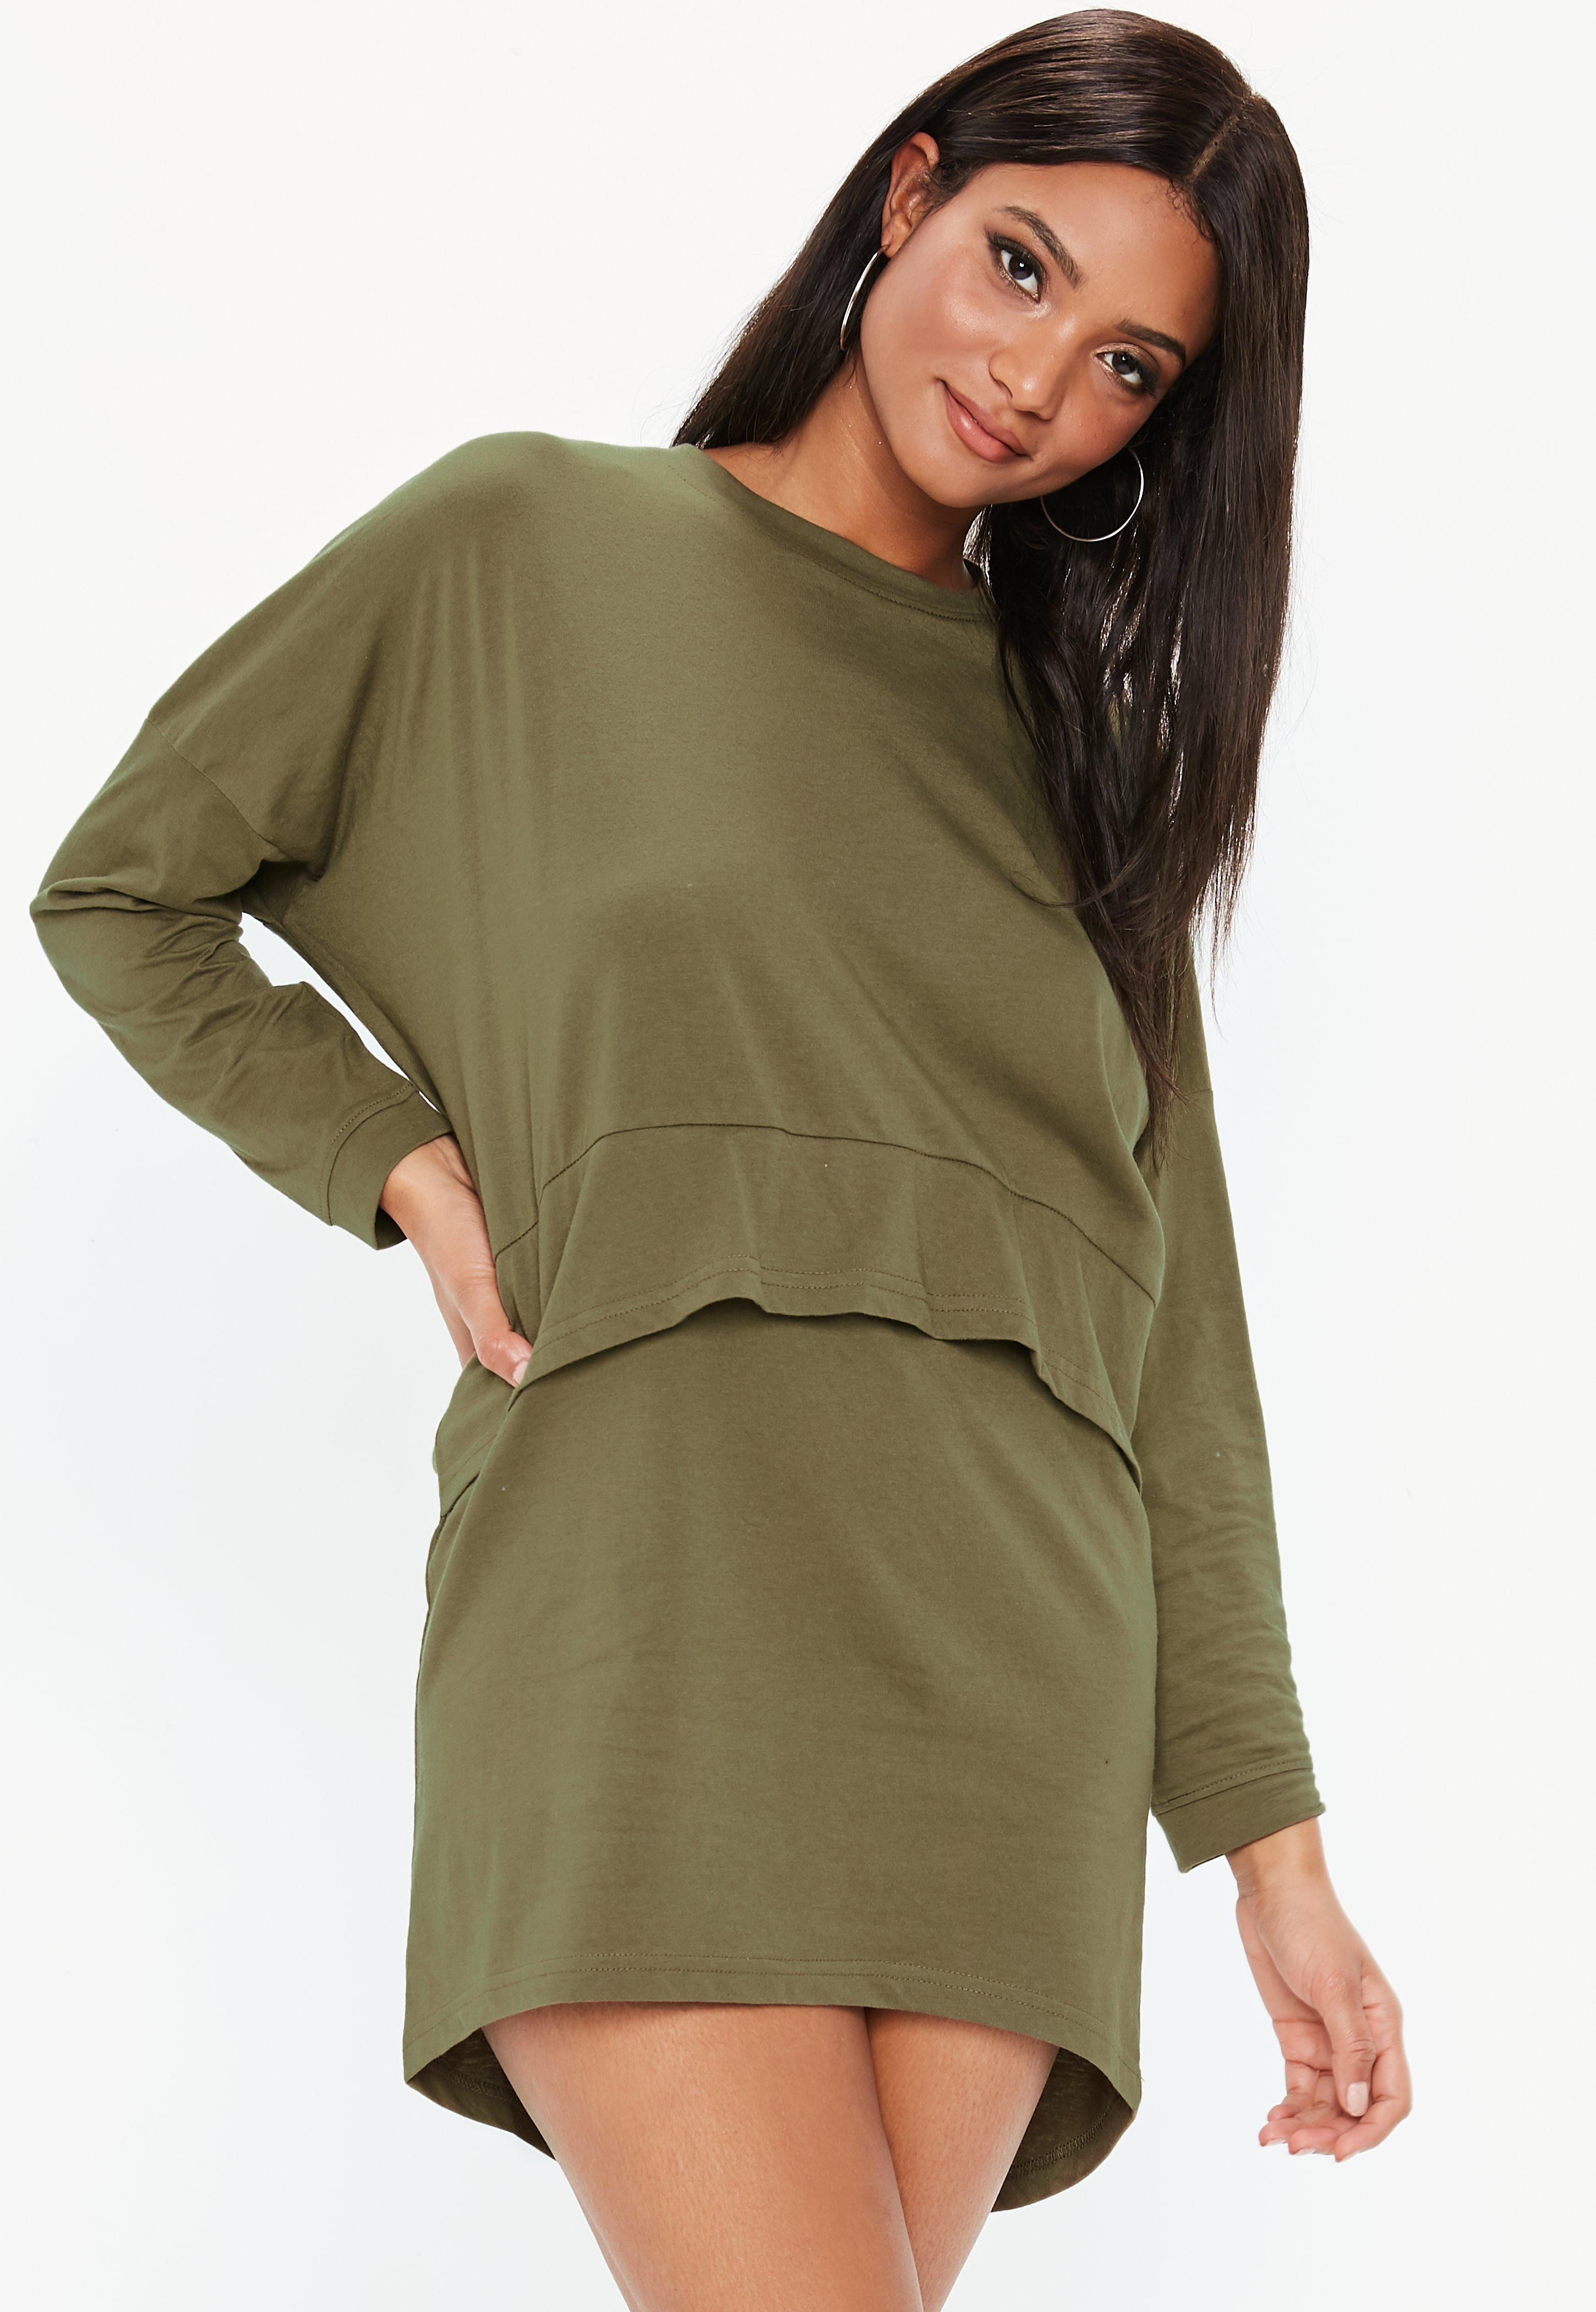 eb37774696d43 khaki-oversized-jersey-overlay-t-shirt-dress